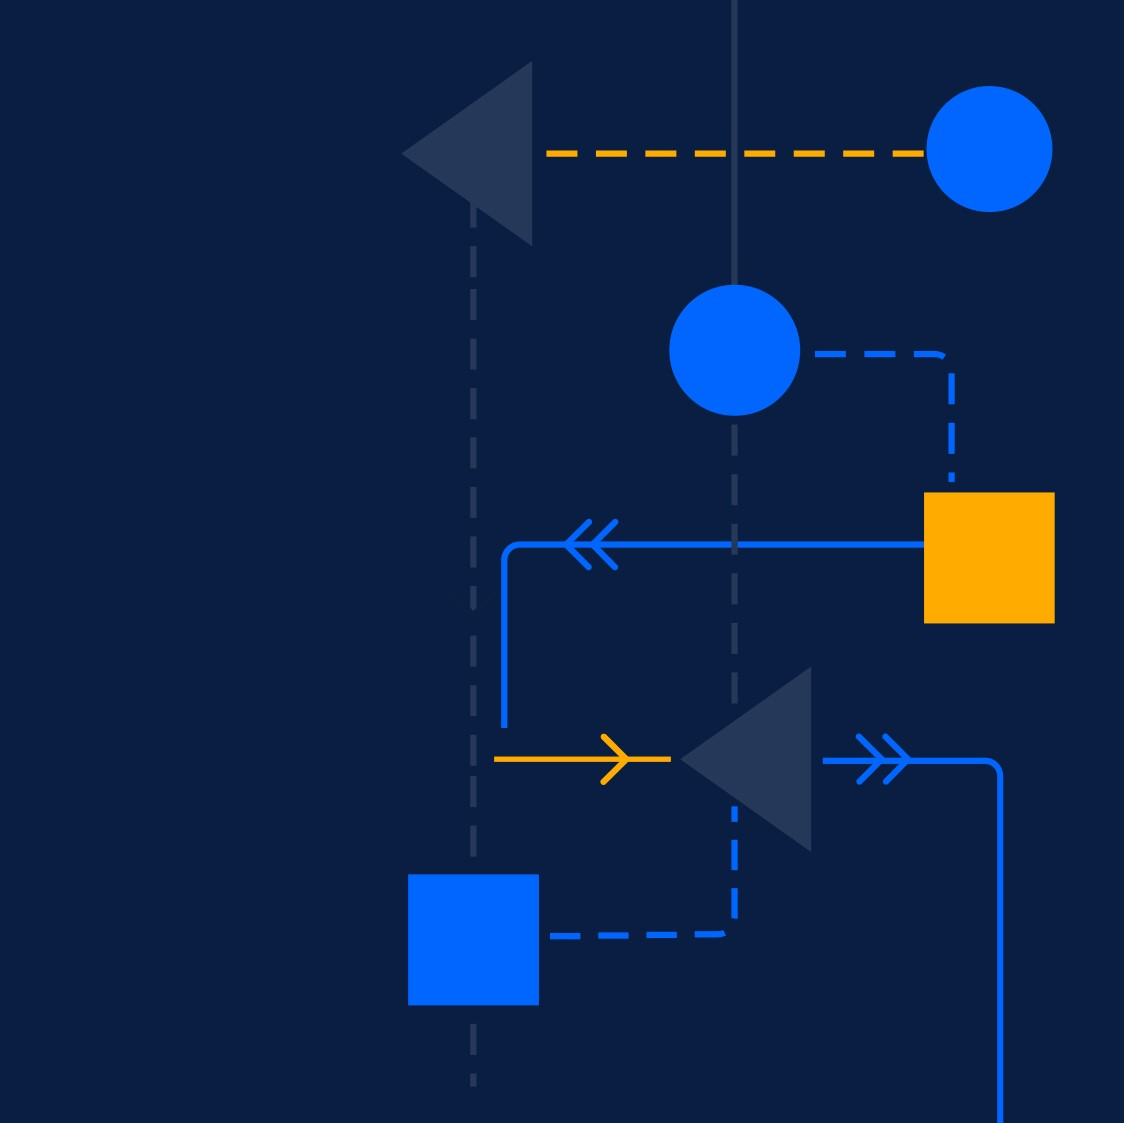 Contacta a DEISER para planificar la migración a la nube de Atlassian